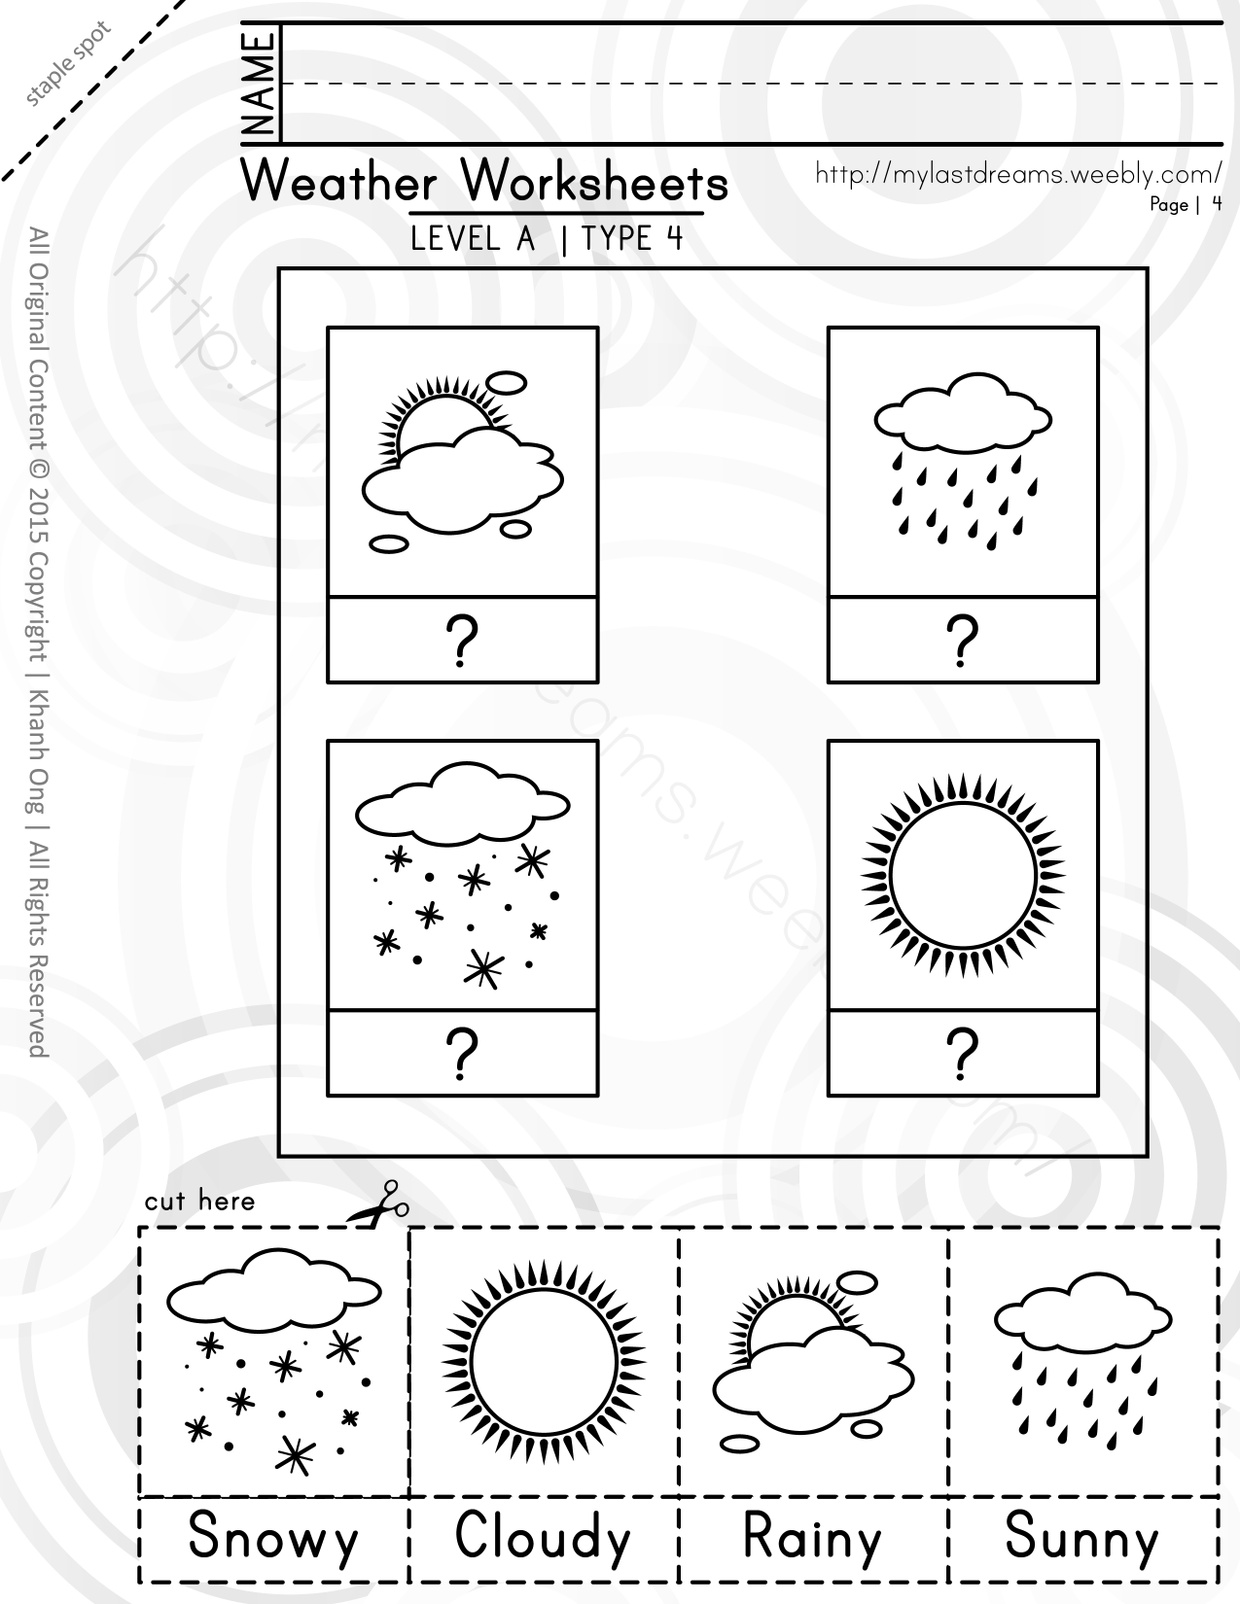 MLD - Basic Weather Worksheets - Part 1 - Letter Sized